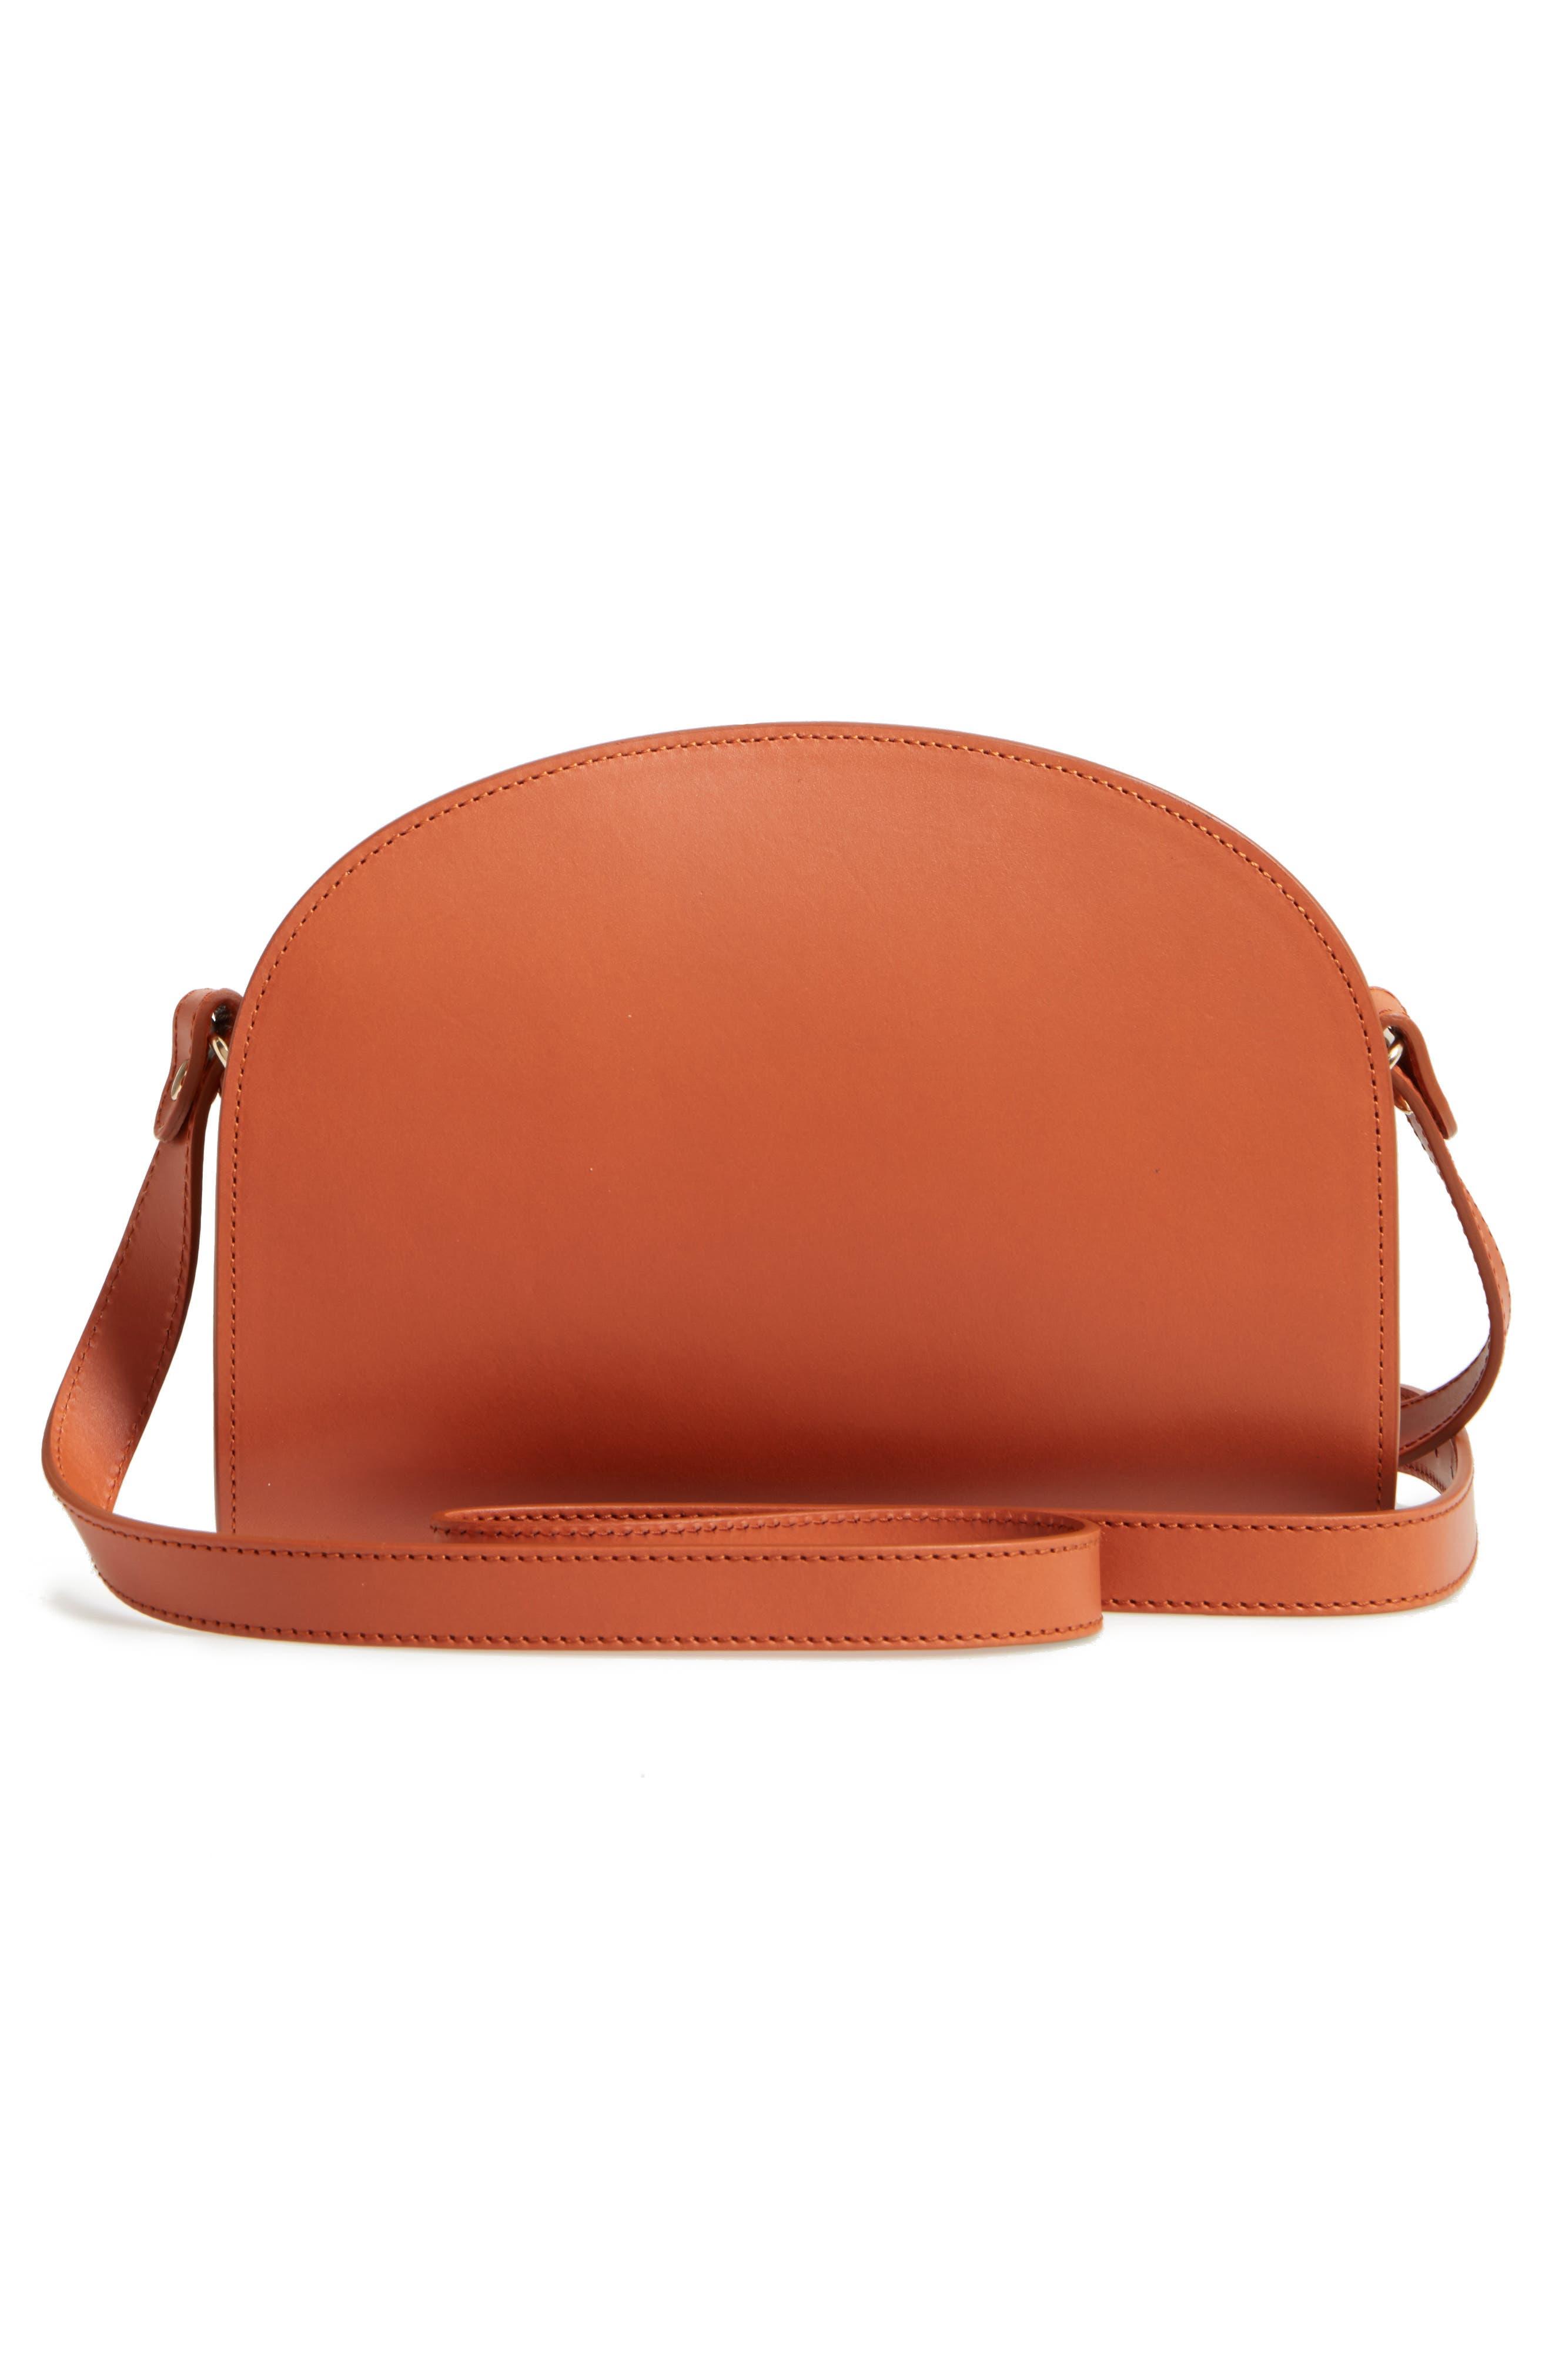 Sac Demi Lune Leather Crossbody Bag,                             Alternate thumbnail 2, color,                             Caramel